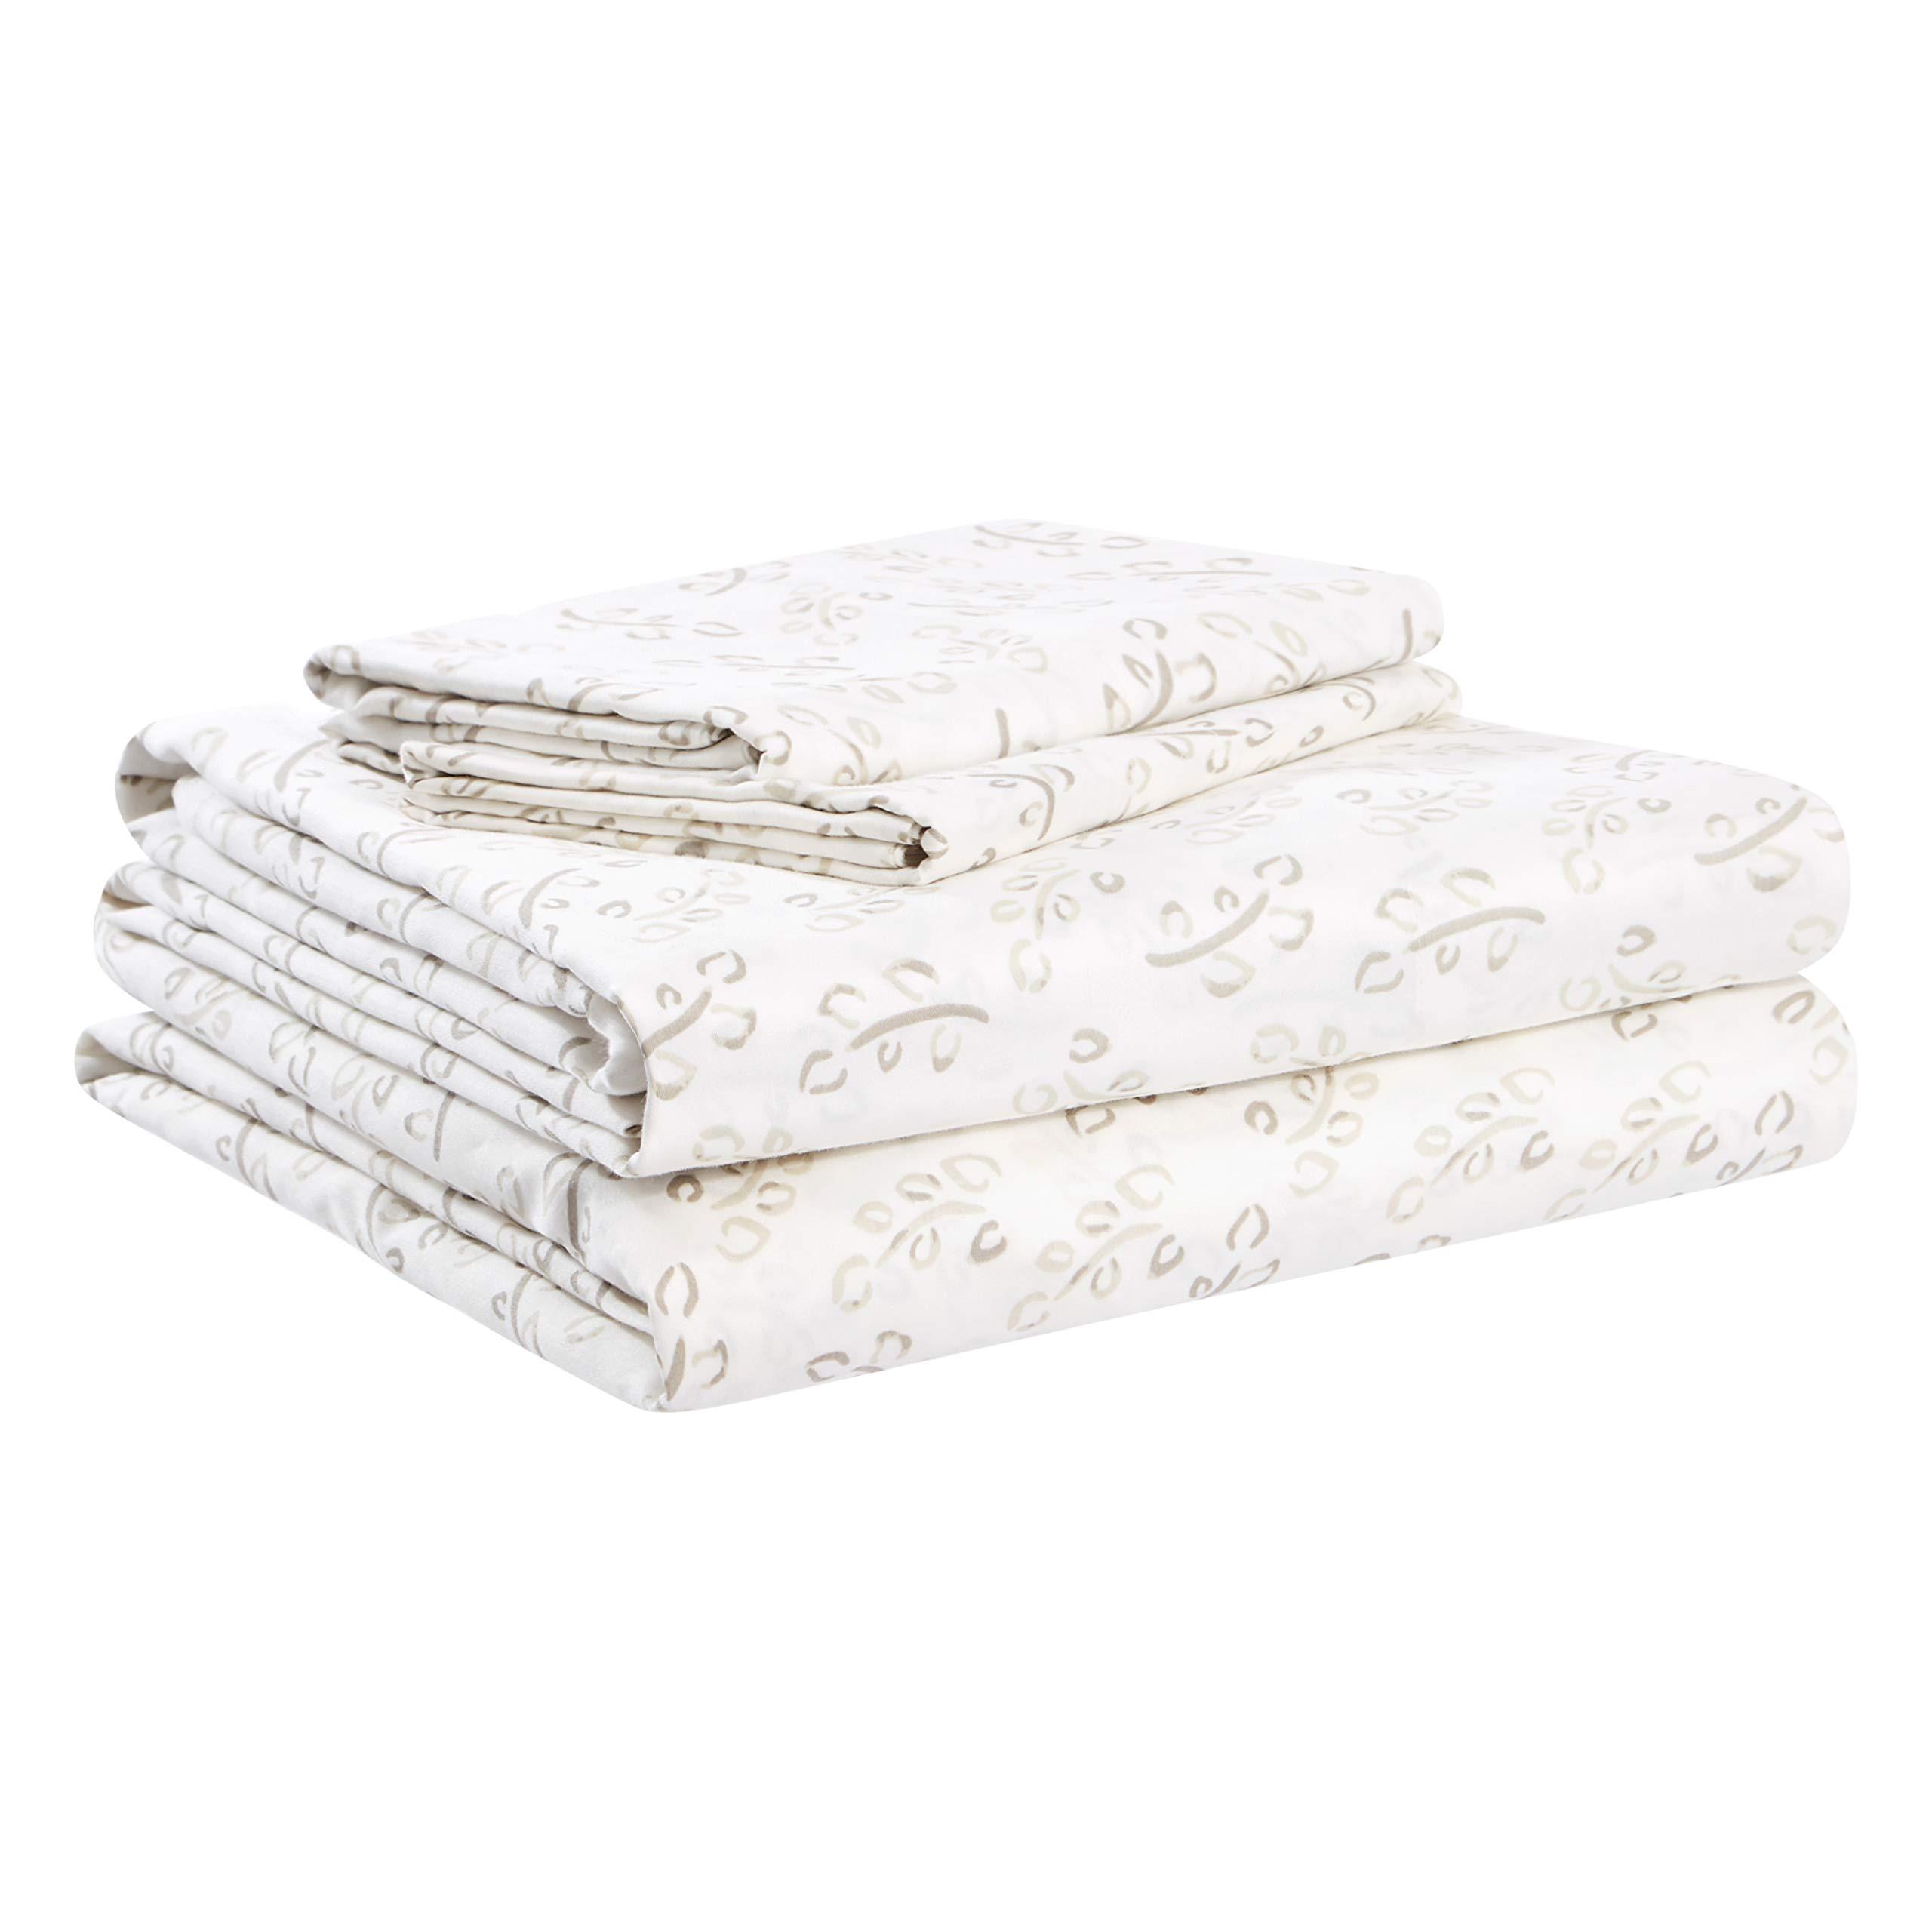 AmazonBasics Organic Sateen Cotton Sheet Set - Full, Watercolor Vine